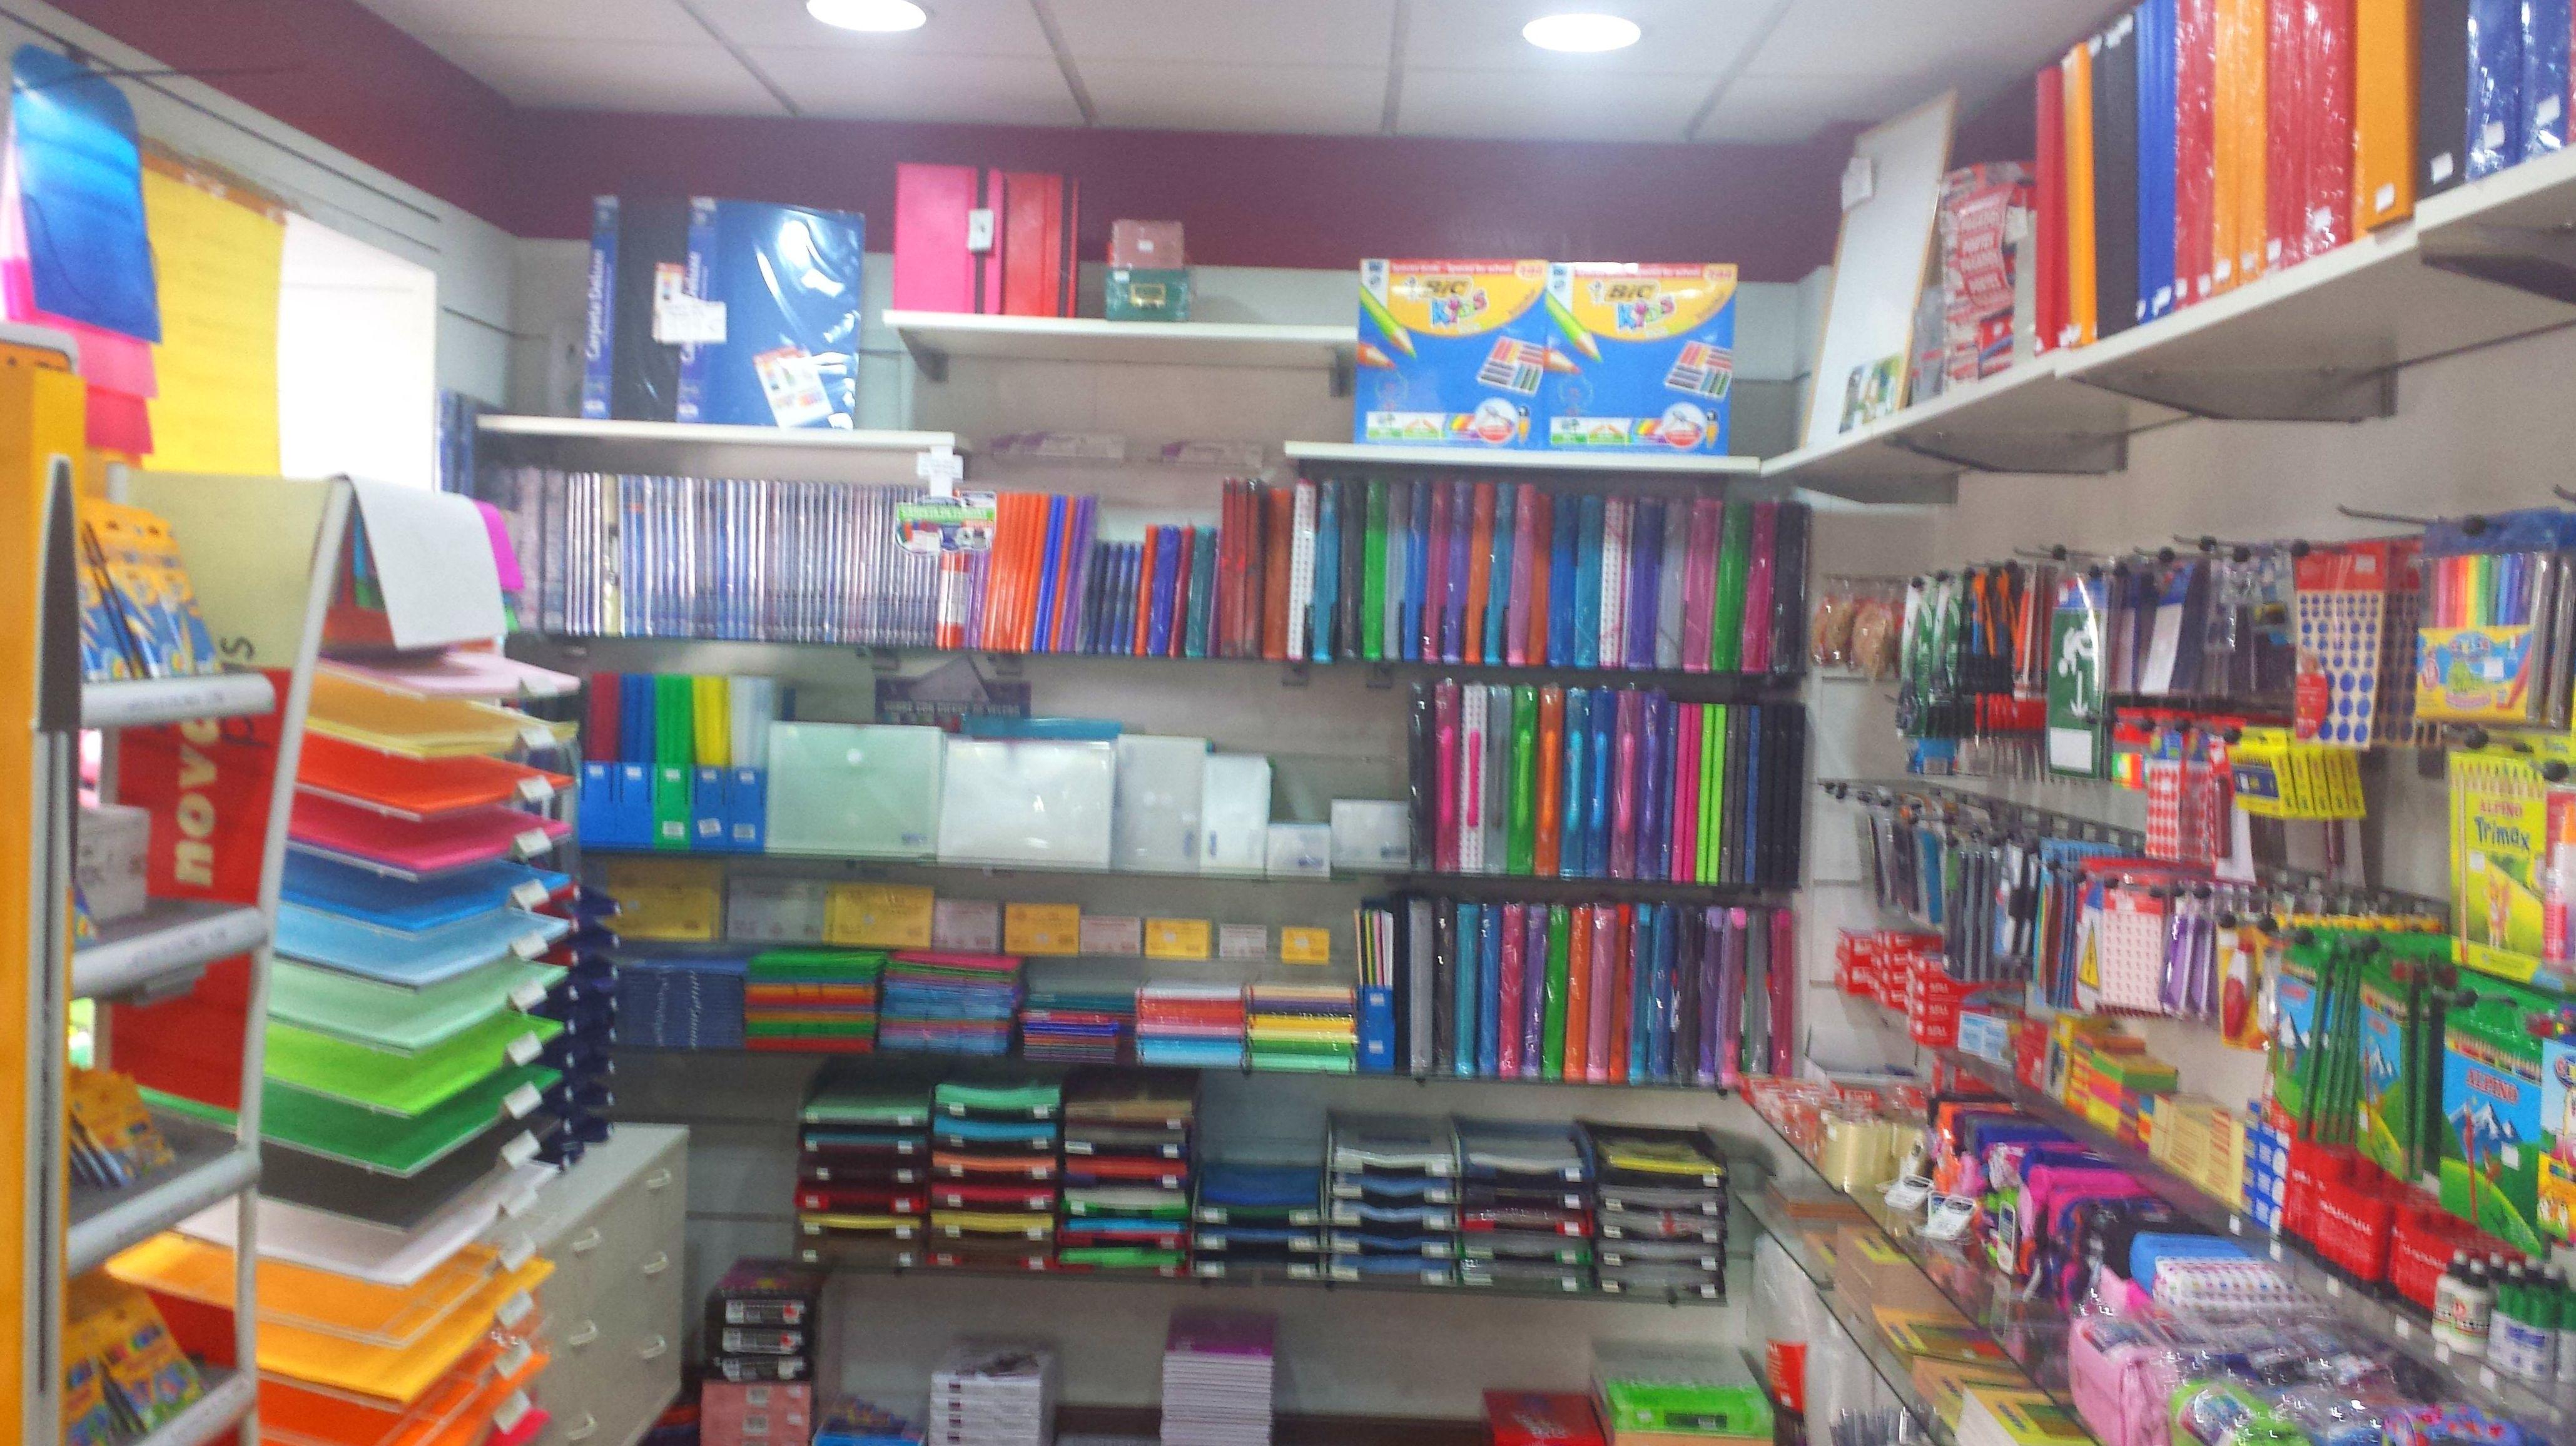 Foto 9 de papeler as en c rdoba francis suministros de oficina y papeler a - Papeleria de oficina ...